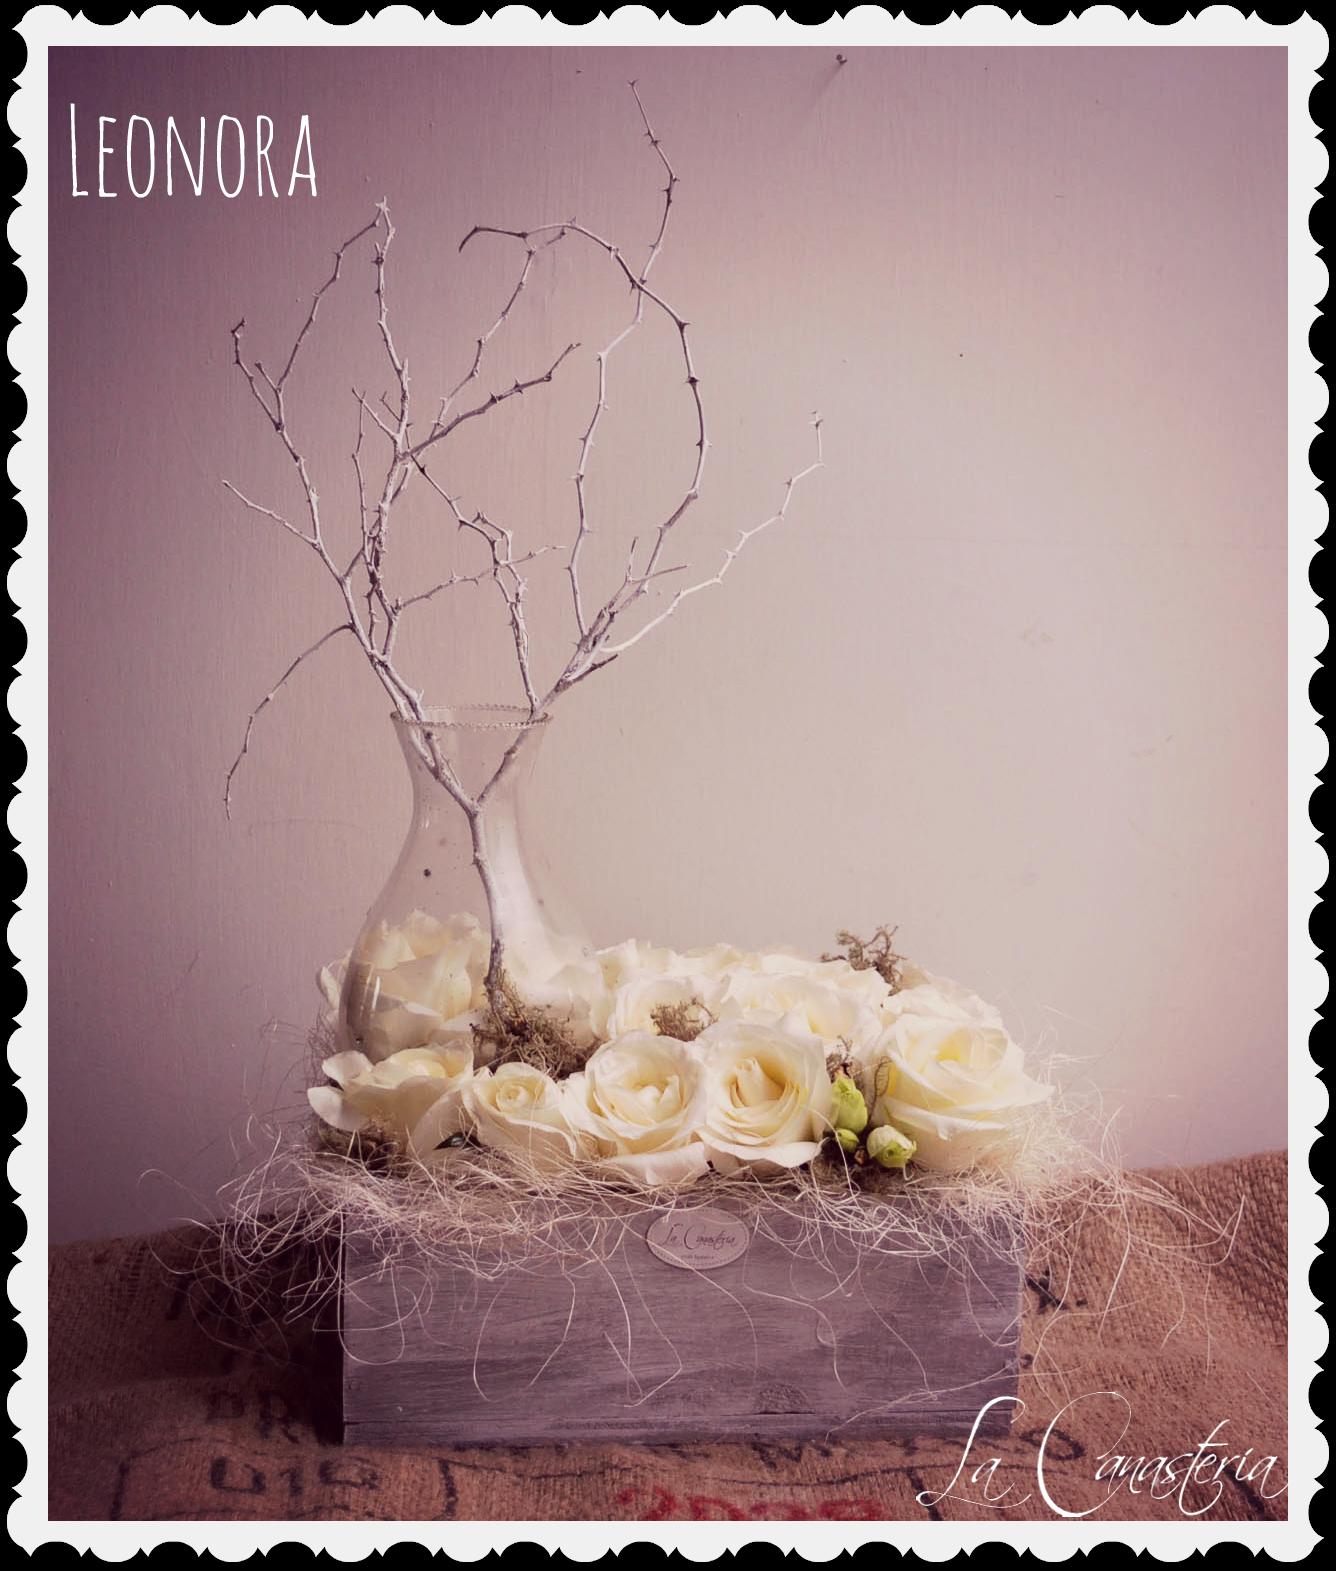 Leonora_Title_Logo_Frame